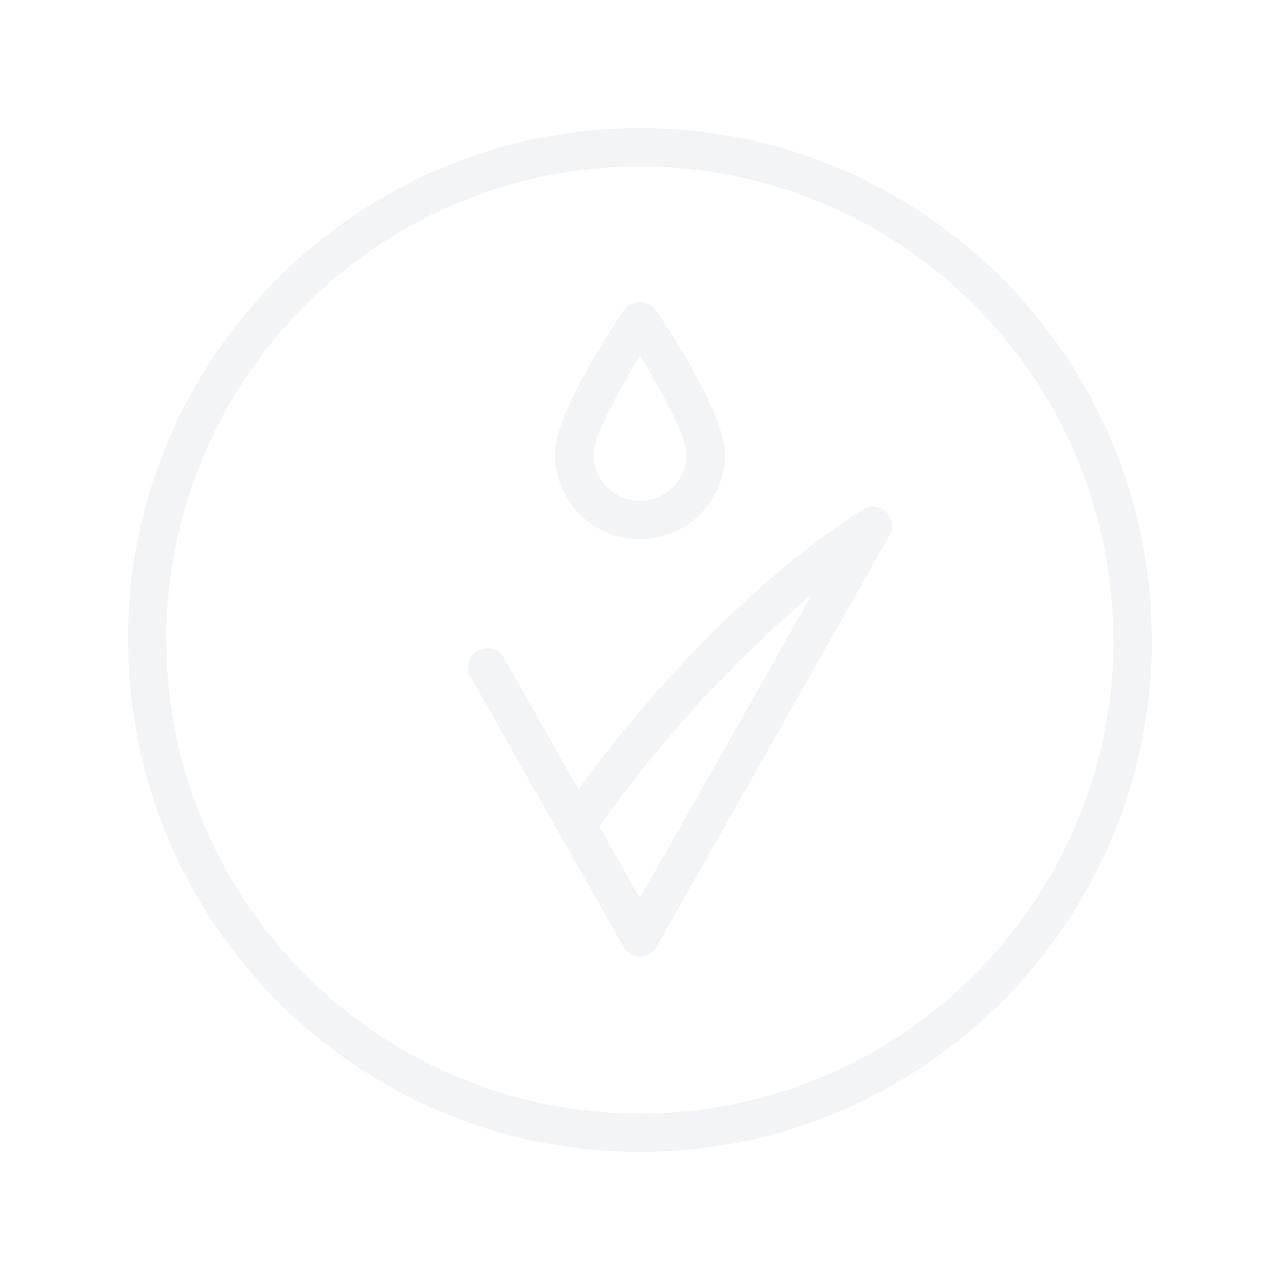 BEAUTYBLENDER Beauty Blusher (Grey)